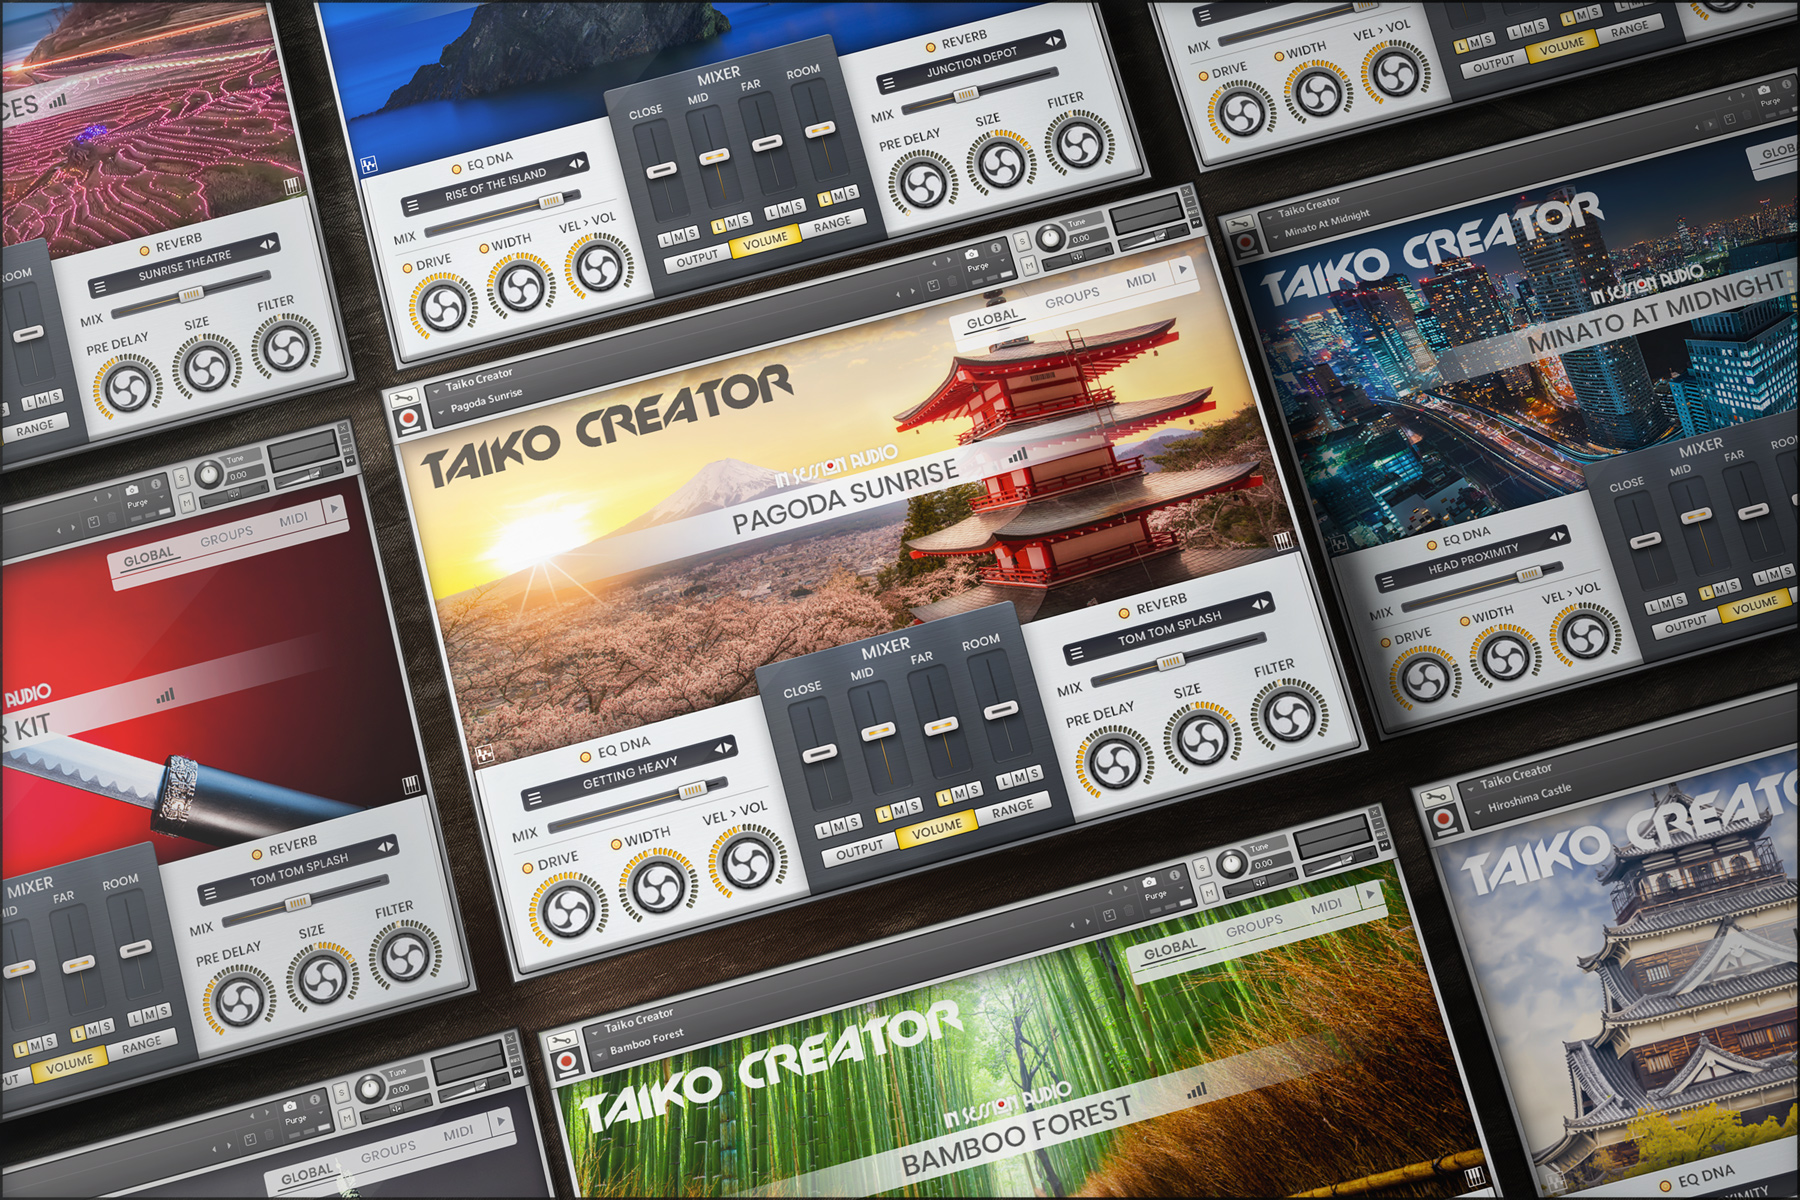 Taiko-Creator-Compilation-1800x